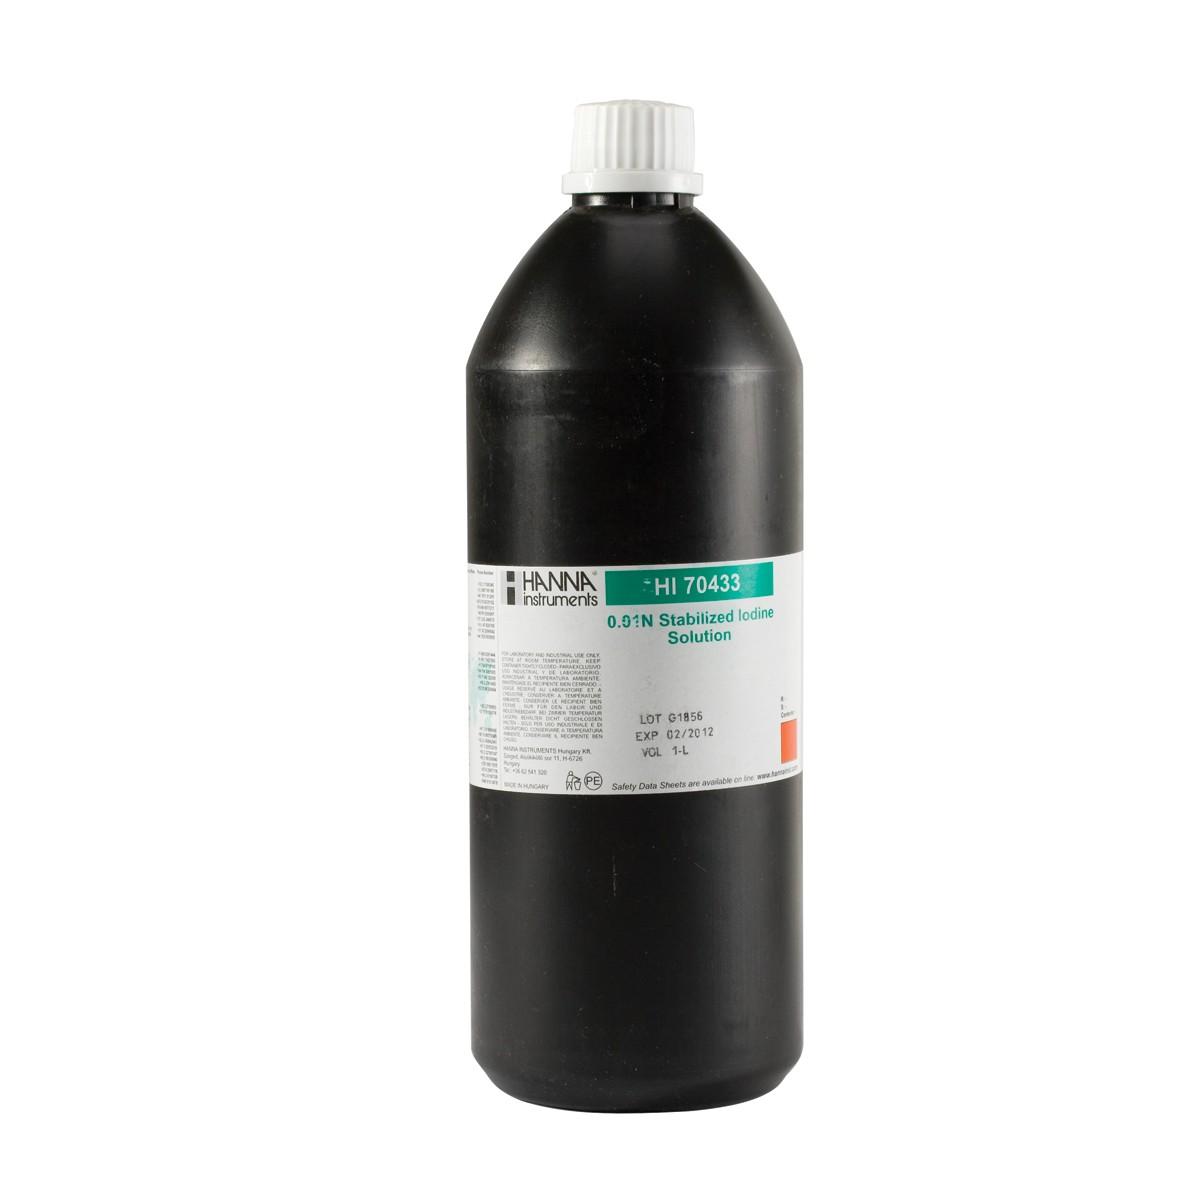 Stabilized Iodine 0.01N, 1L - HI70433